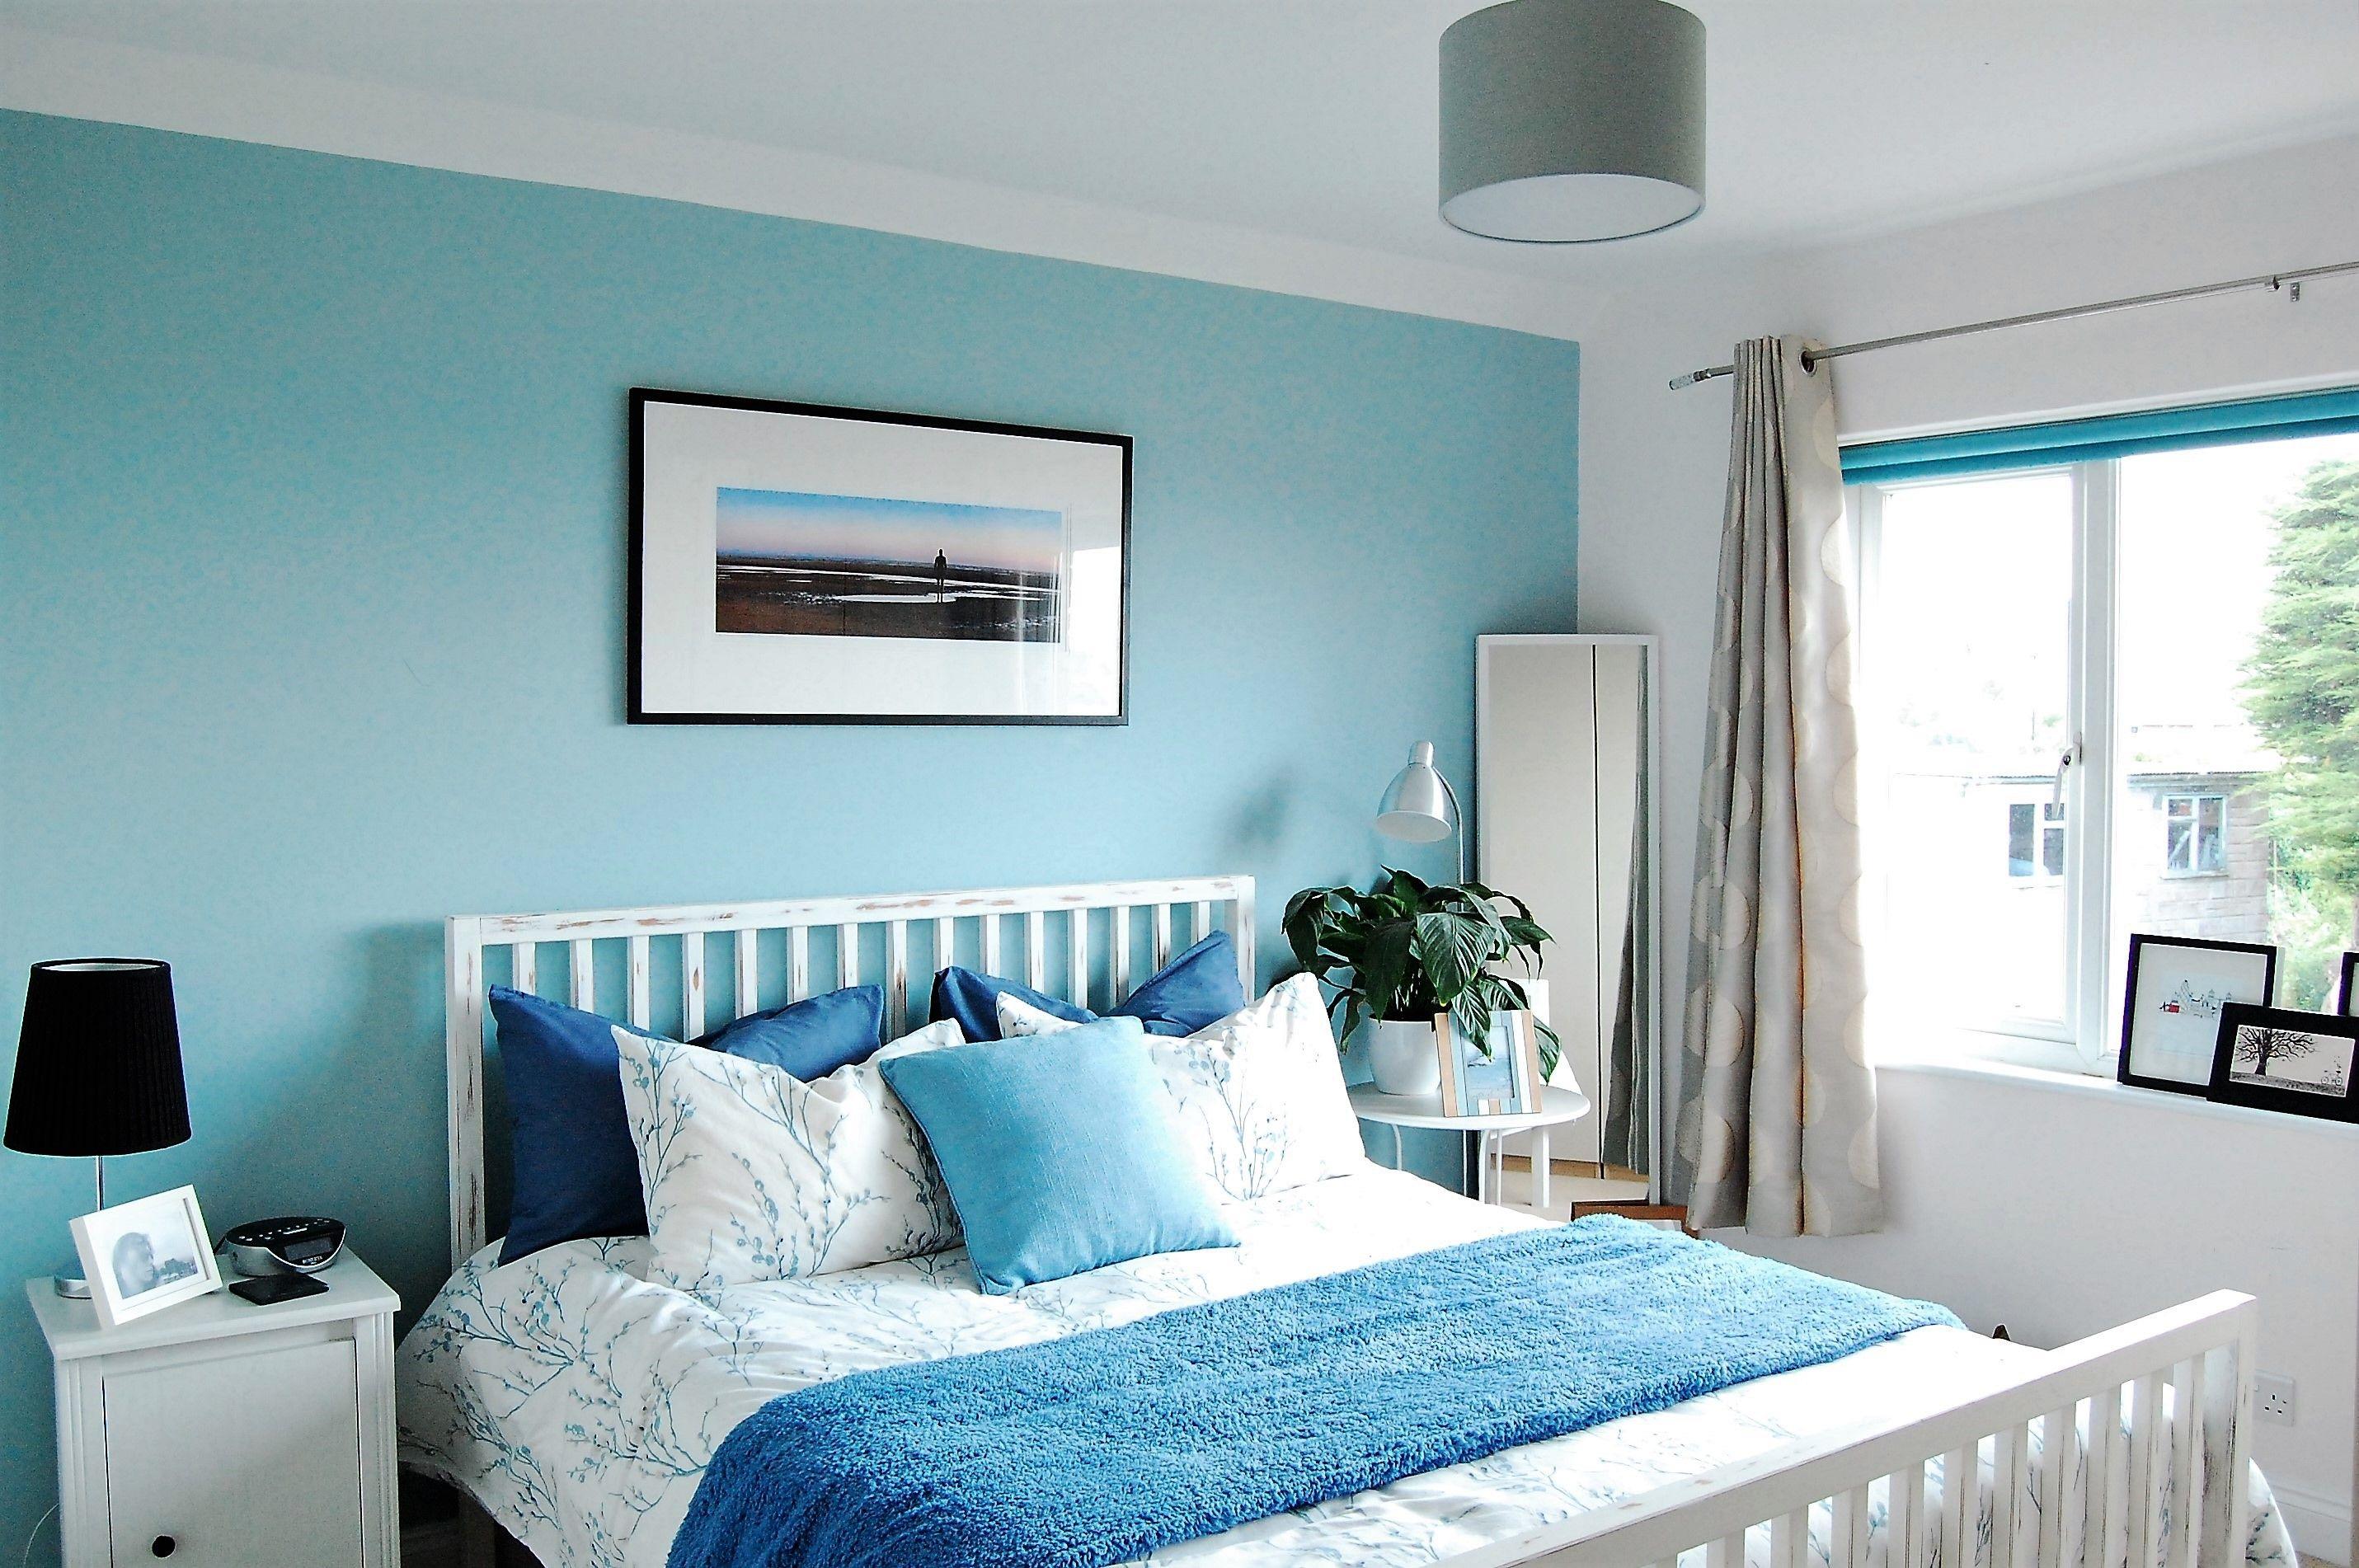 Decorating With Blue Relaxing Bedroom Bedroom Interior Interior Design Bedroom